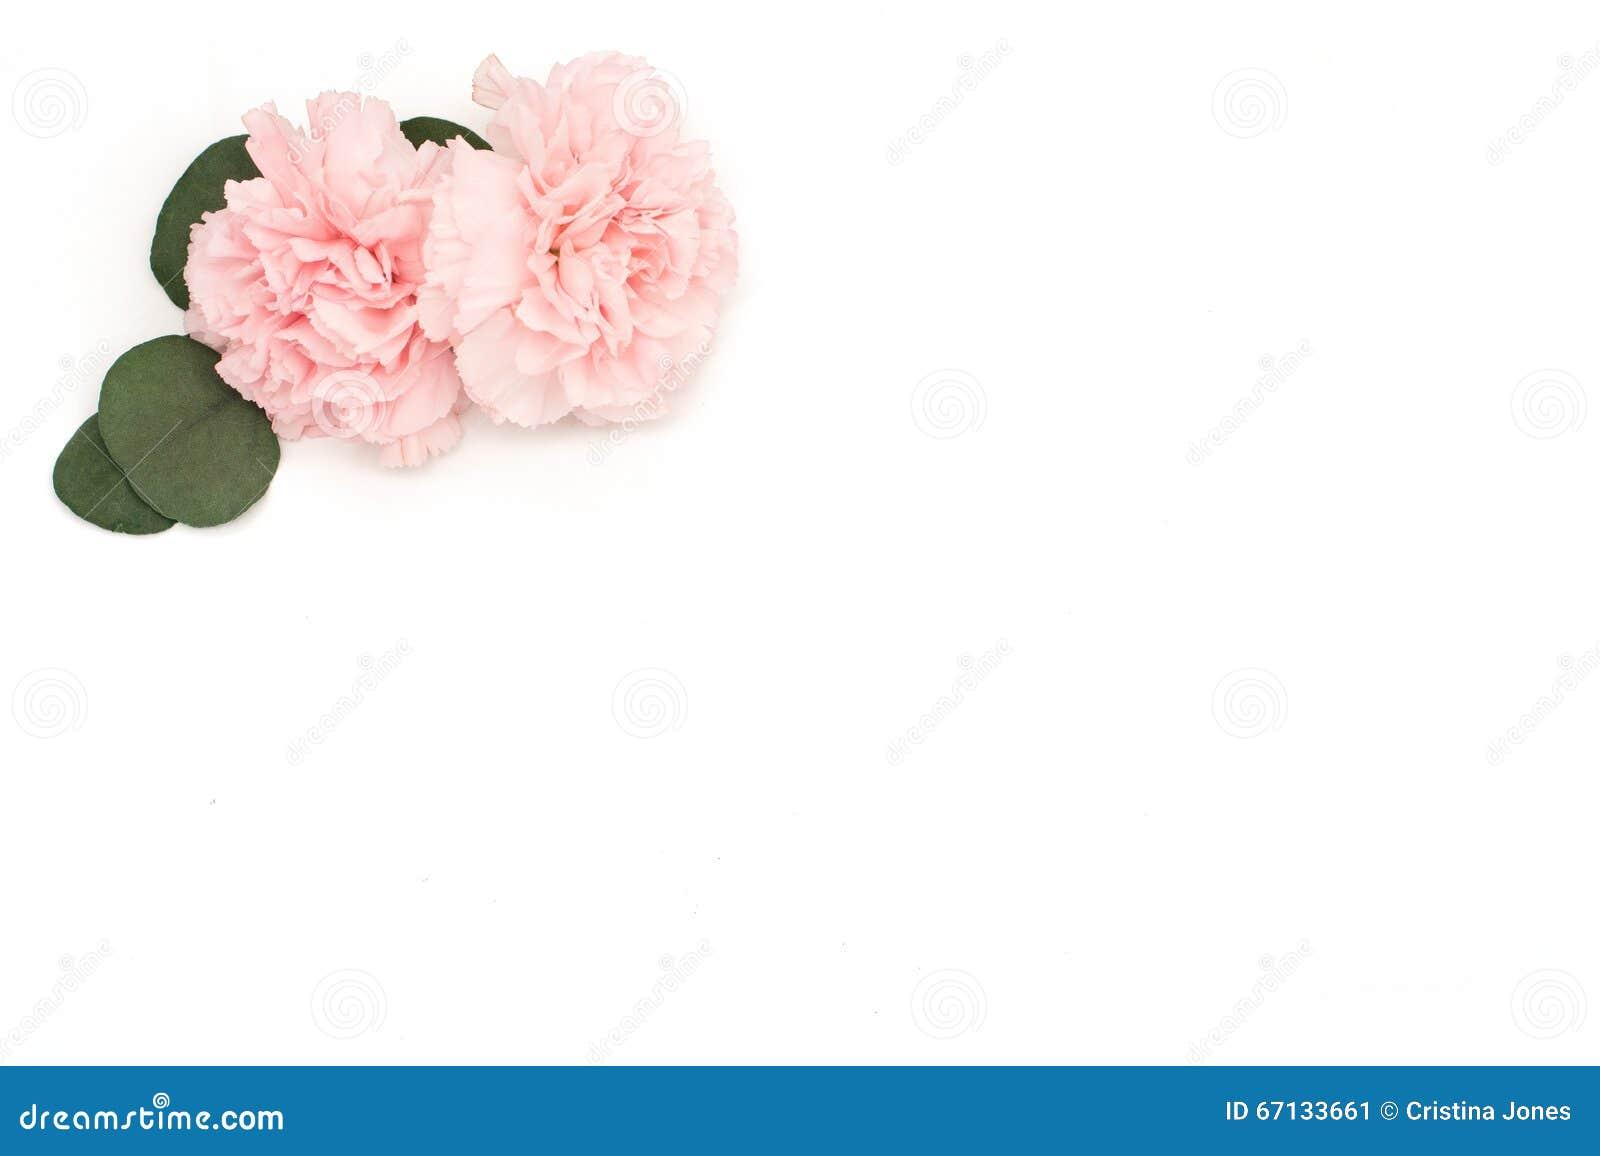 Pink flower and eucalyptus corner flower on white background stock pink flower and eucalyptus corner flower on white background mightylinksfo